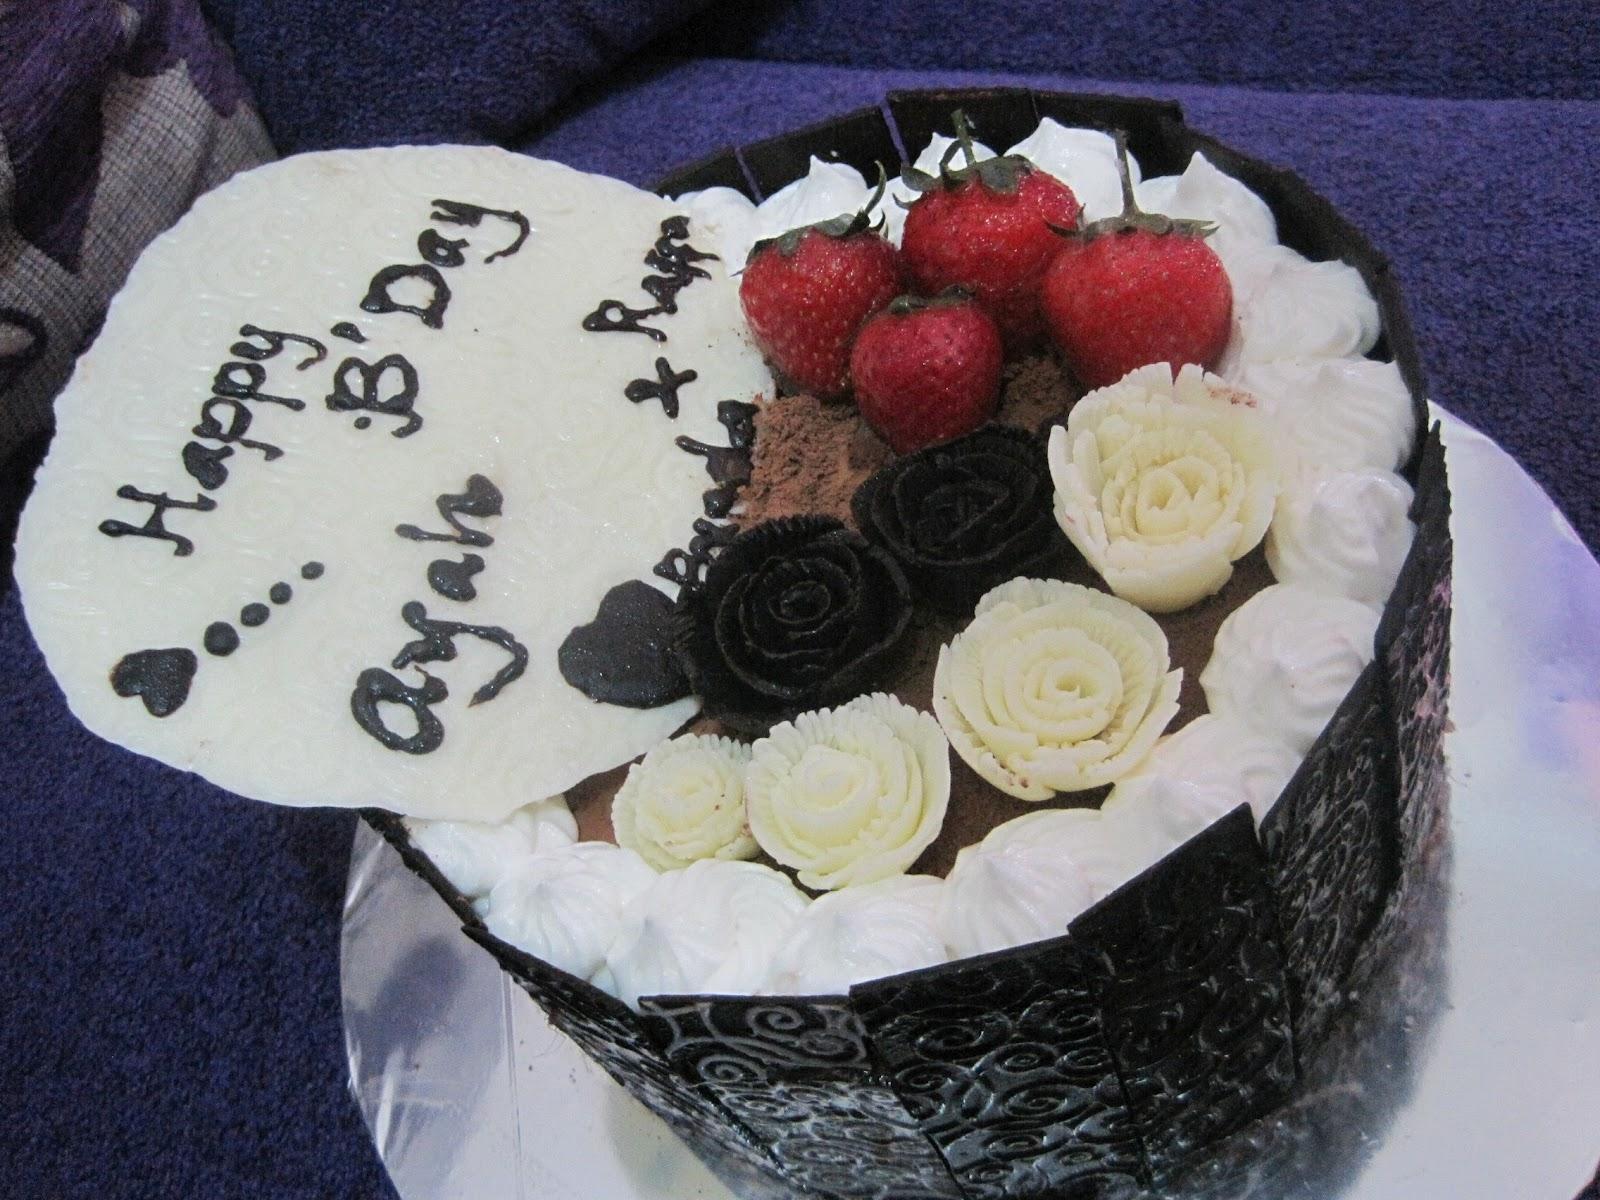 New Experience In Baking Chocolate Truffle Cake Spon Fancy Bulat Coklat Soal Rasa Upss Jangan Ditanya Pilihan Aku Ngga Salah Ini Rasanya Enak Banget Creamnya Lembut Klo Dah Agak Beku Kaya Es Krim